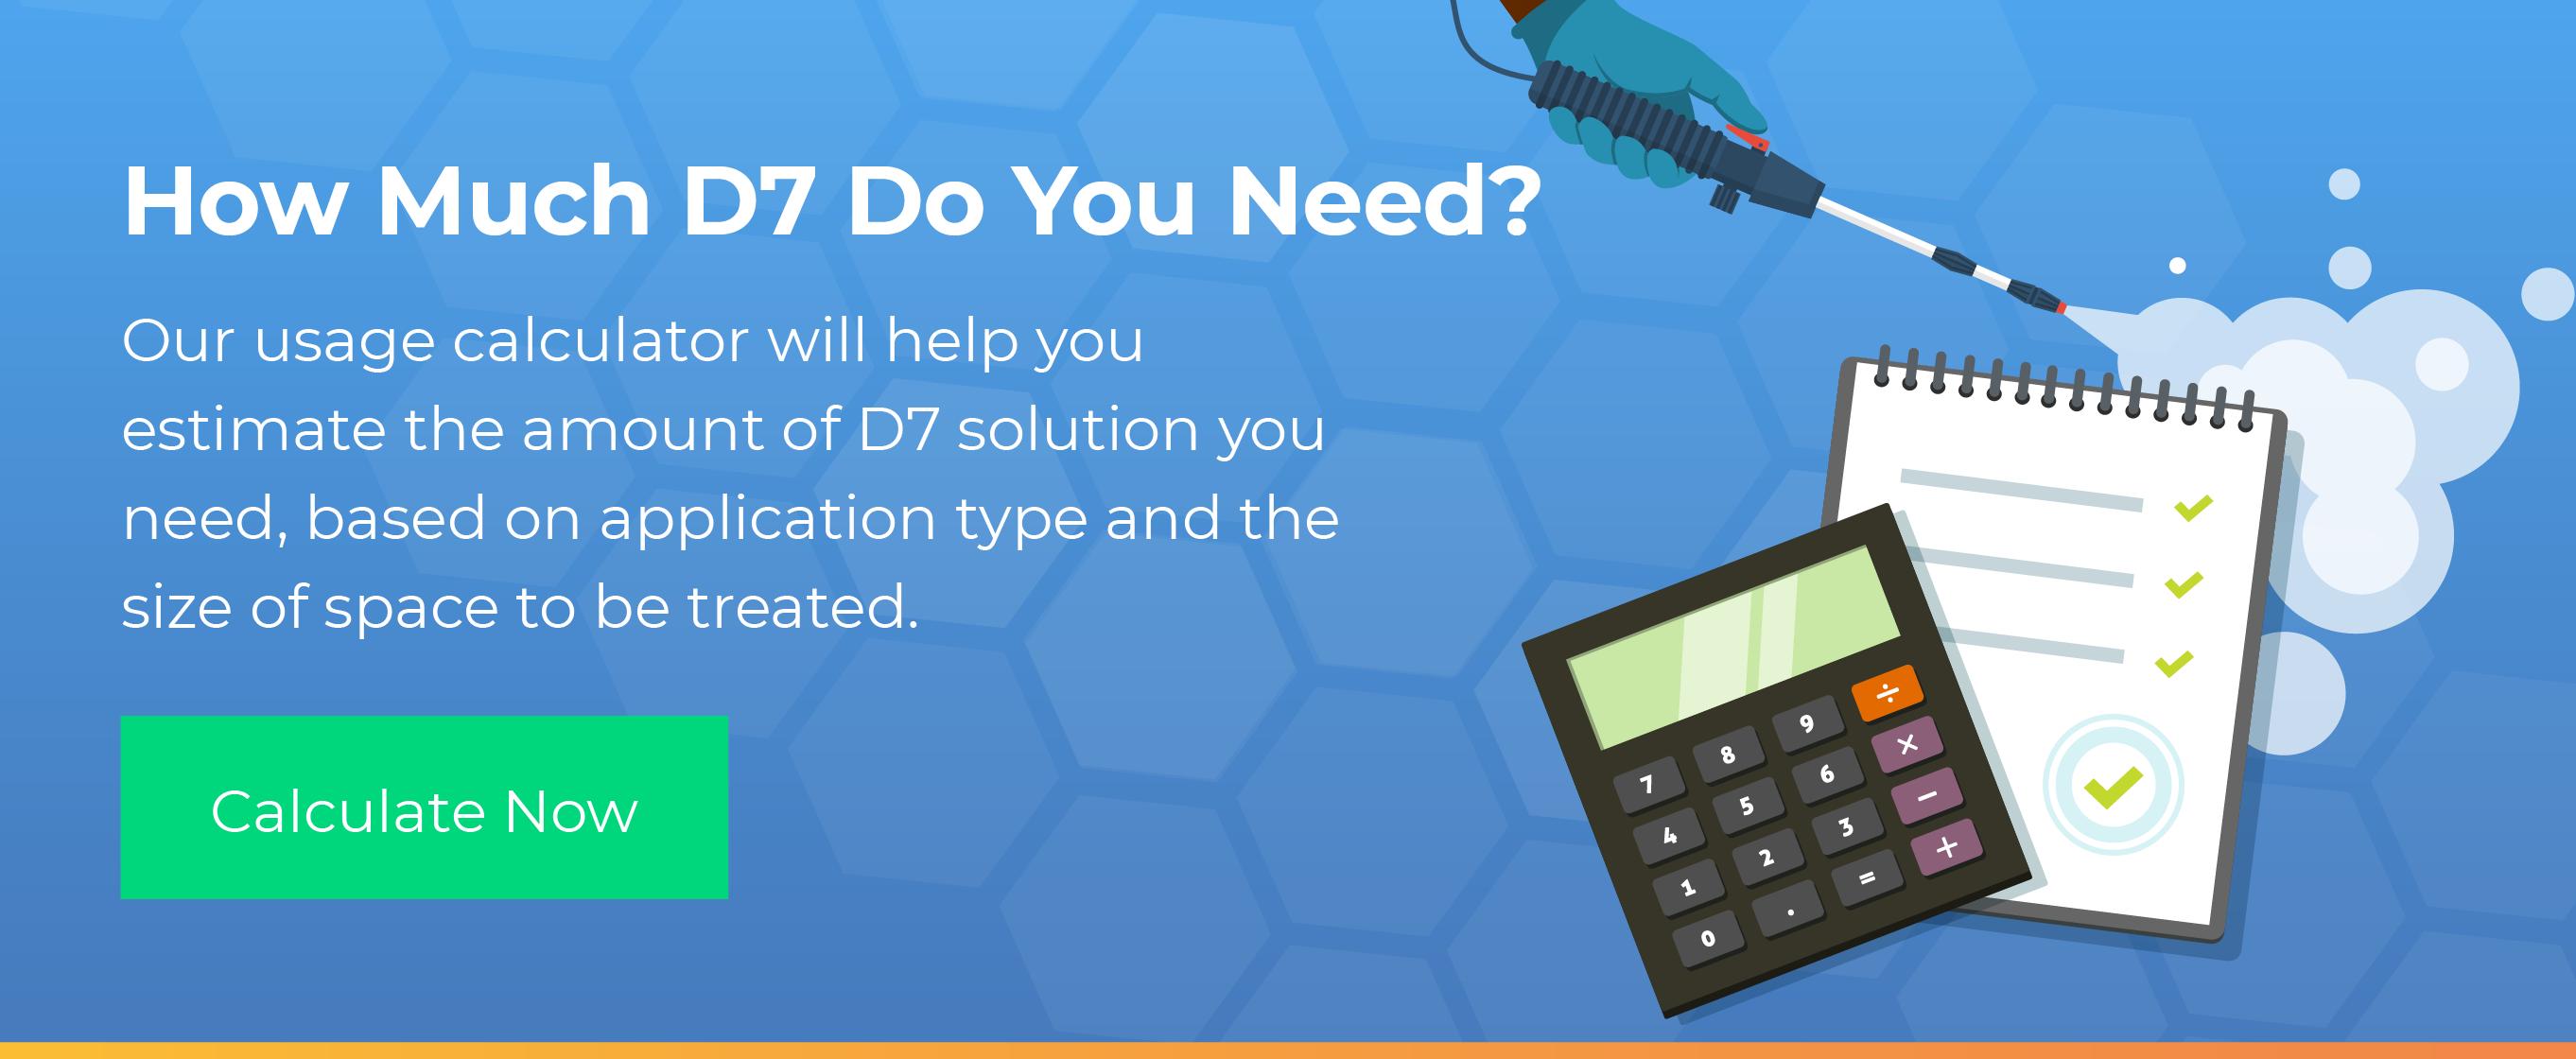 D7 Calculator